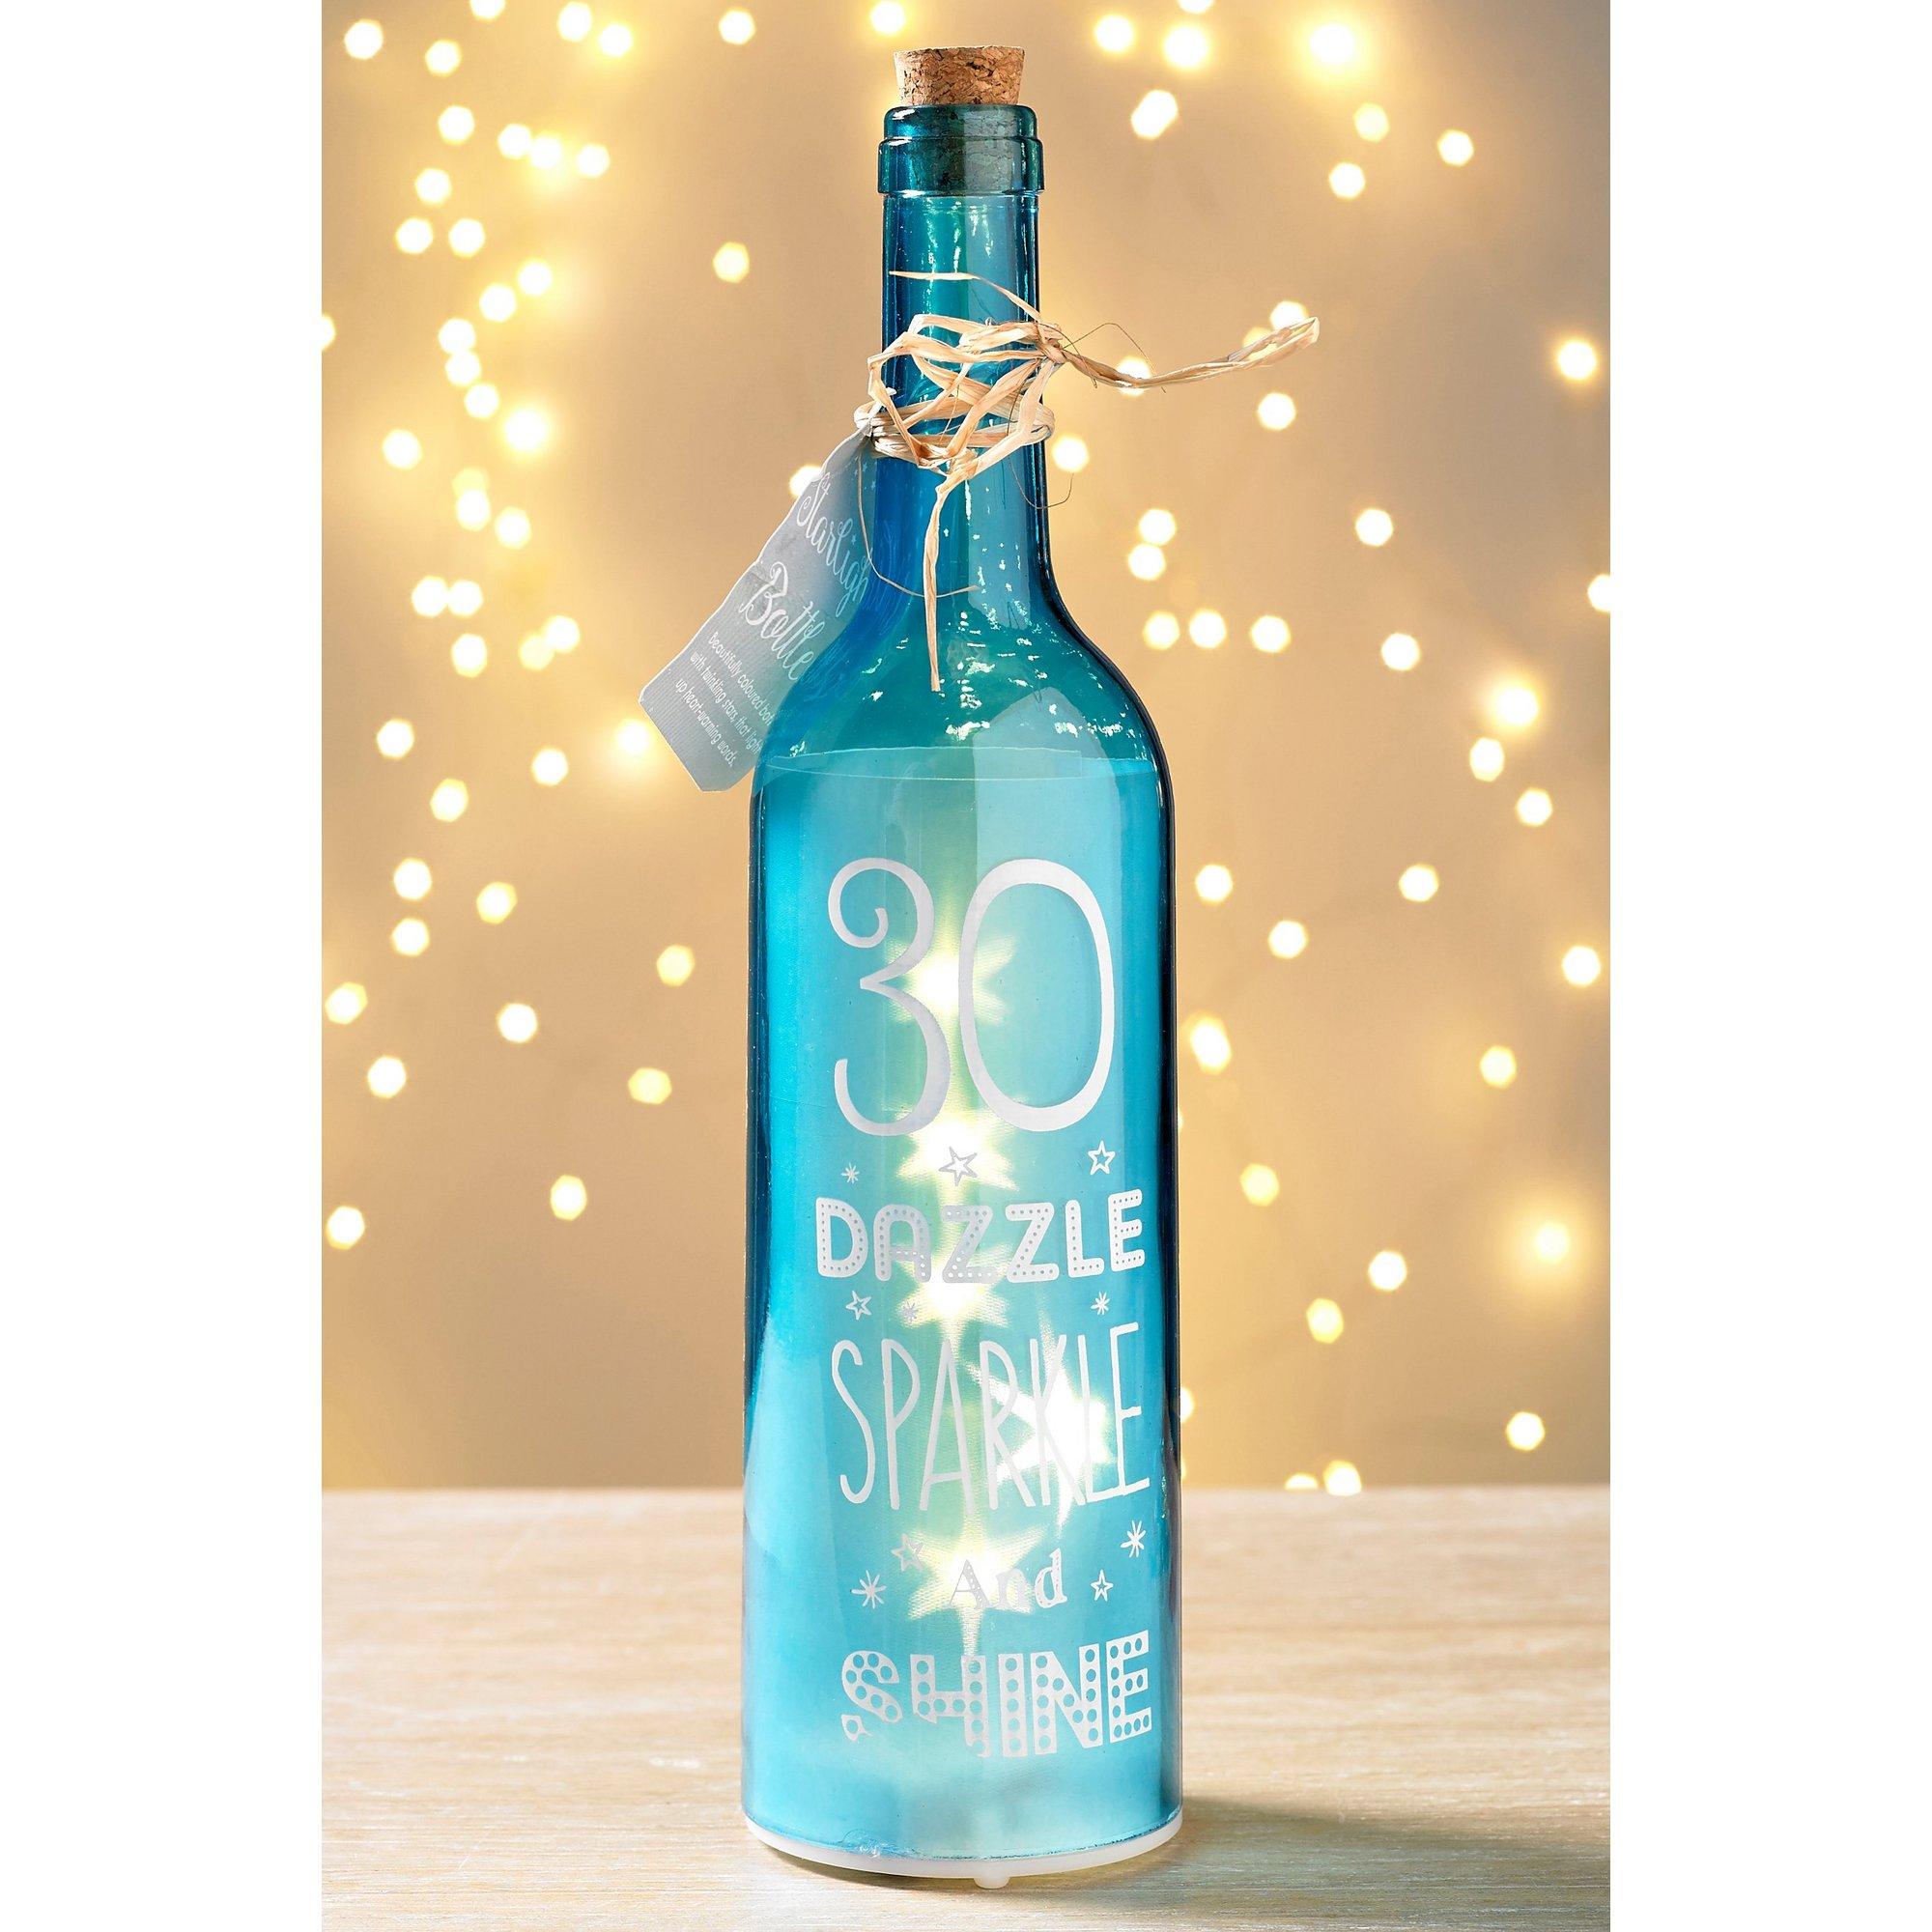 Image of 30th Birthday Starlight Bottle